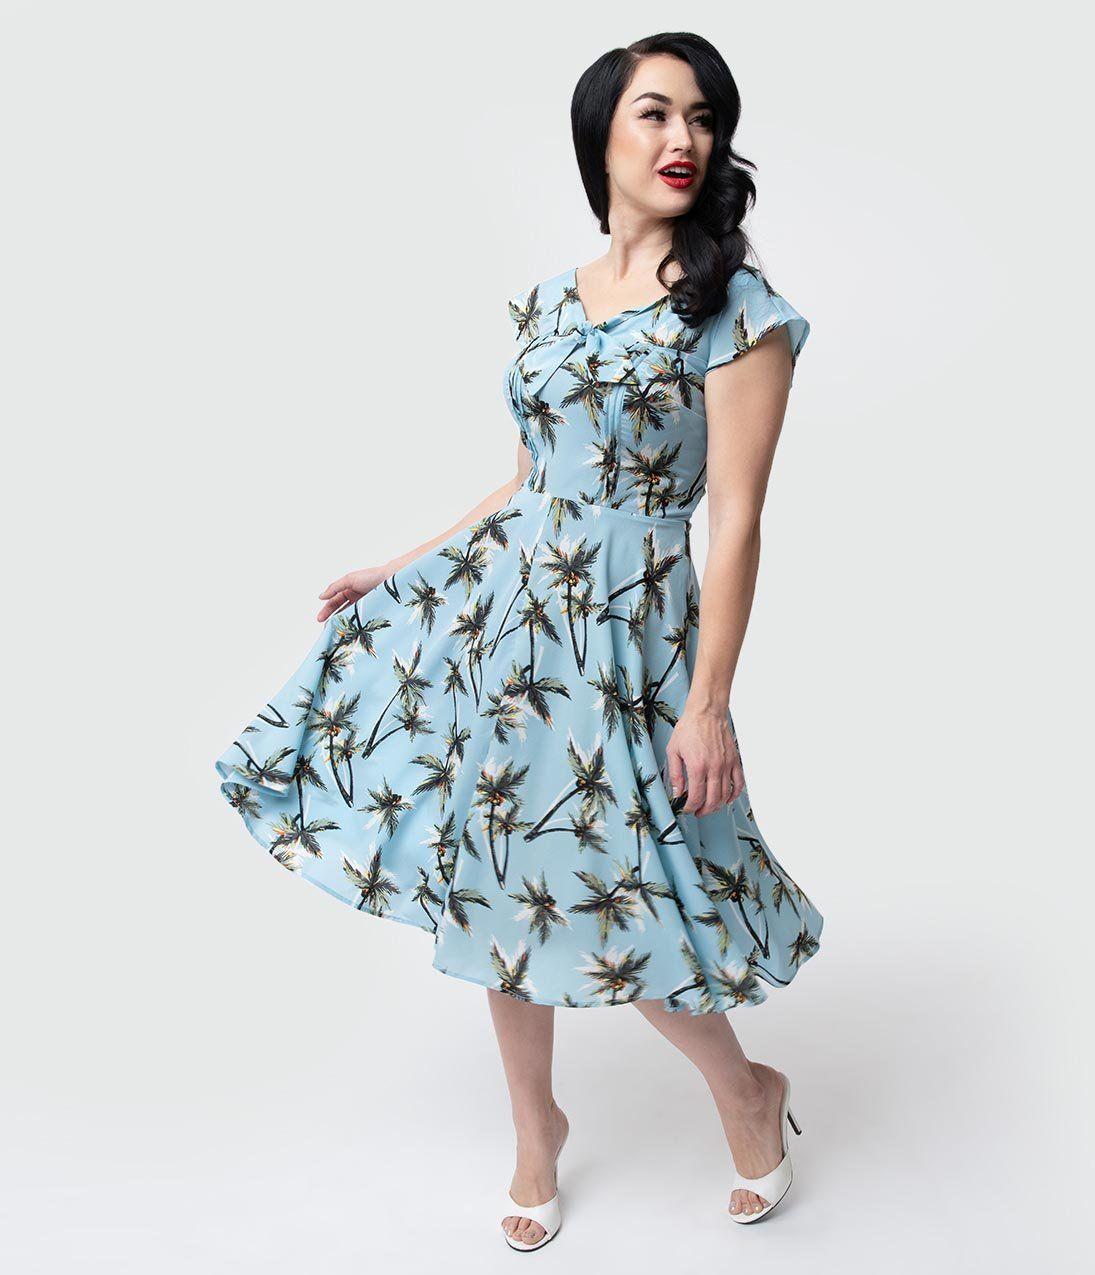 1940s Dresses 40s Dress Swing Dress Unique Vintage 1940s Style Light Blue Palm Tree Print Havilland Dress 50 00 1940s Fashion 1940s Dresses Unique Dresses [ 1275 x 1095 Pixel ]